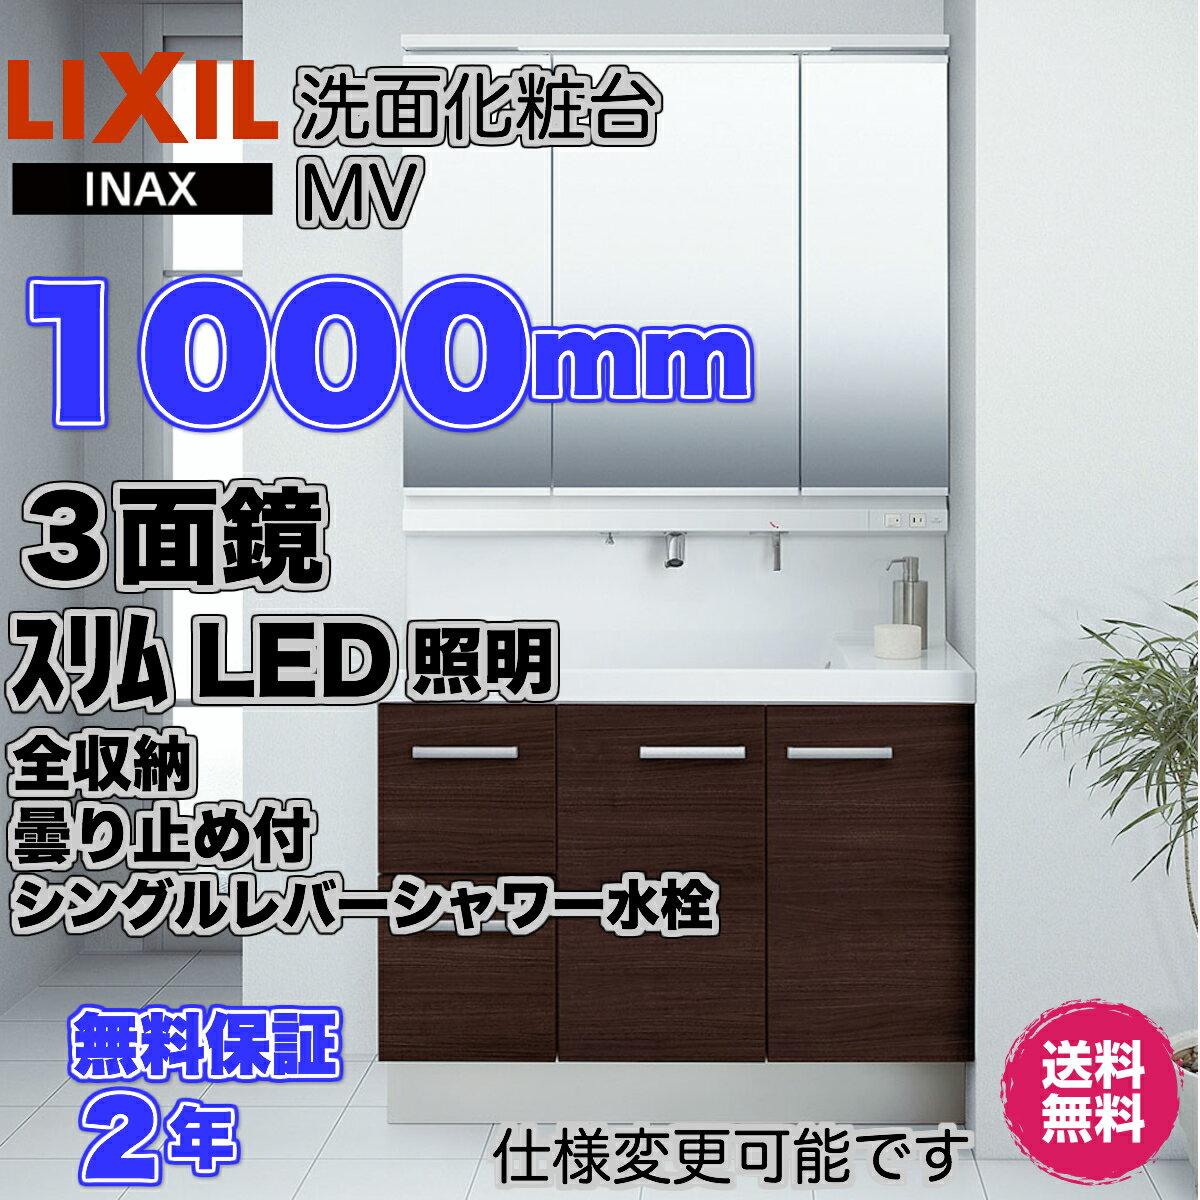 LIXIL リクシル 洗面化粧台 MV 1000mm幅 引出タイプ 三面鏡 全収納 スリムLED照明 シングルレバーシャワー水栓 ハイグレード扉【VJHK-1005SY/LD2H MVJ1-1003TXJU】INAX LIXIL